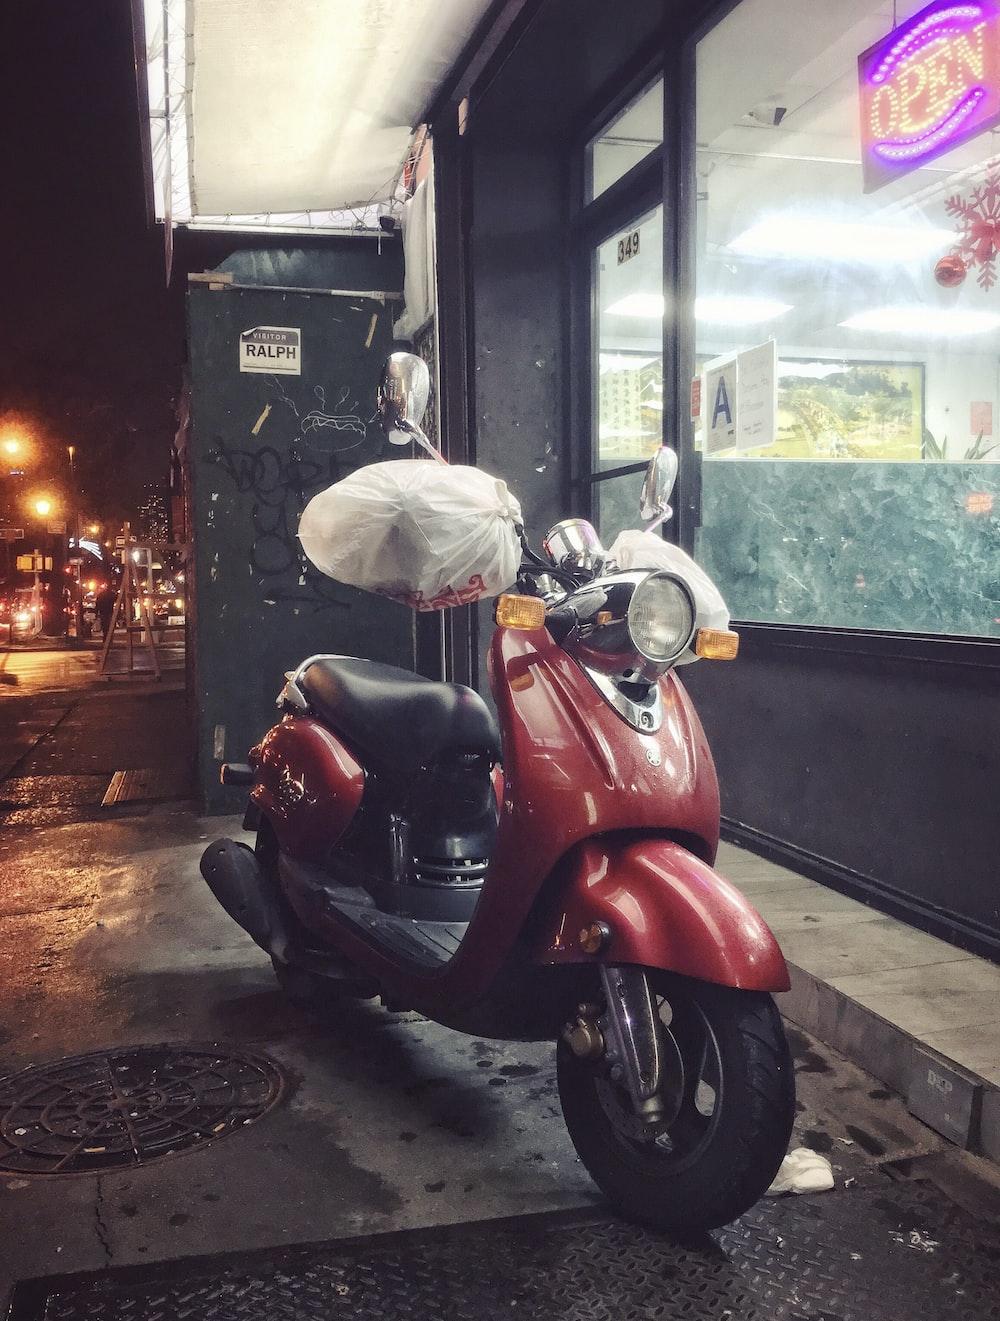 red and black motor scooter parking beside establishment